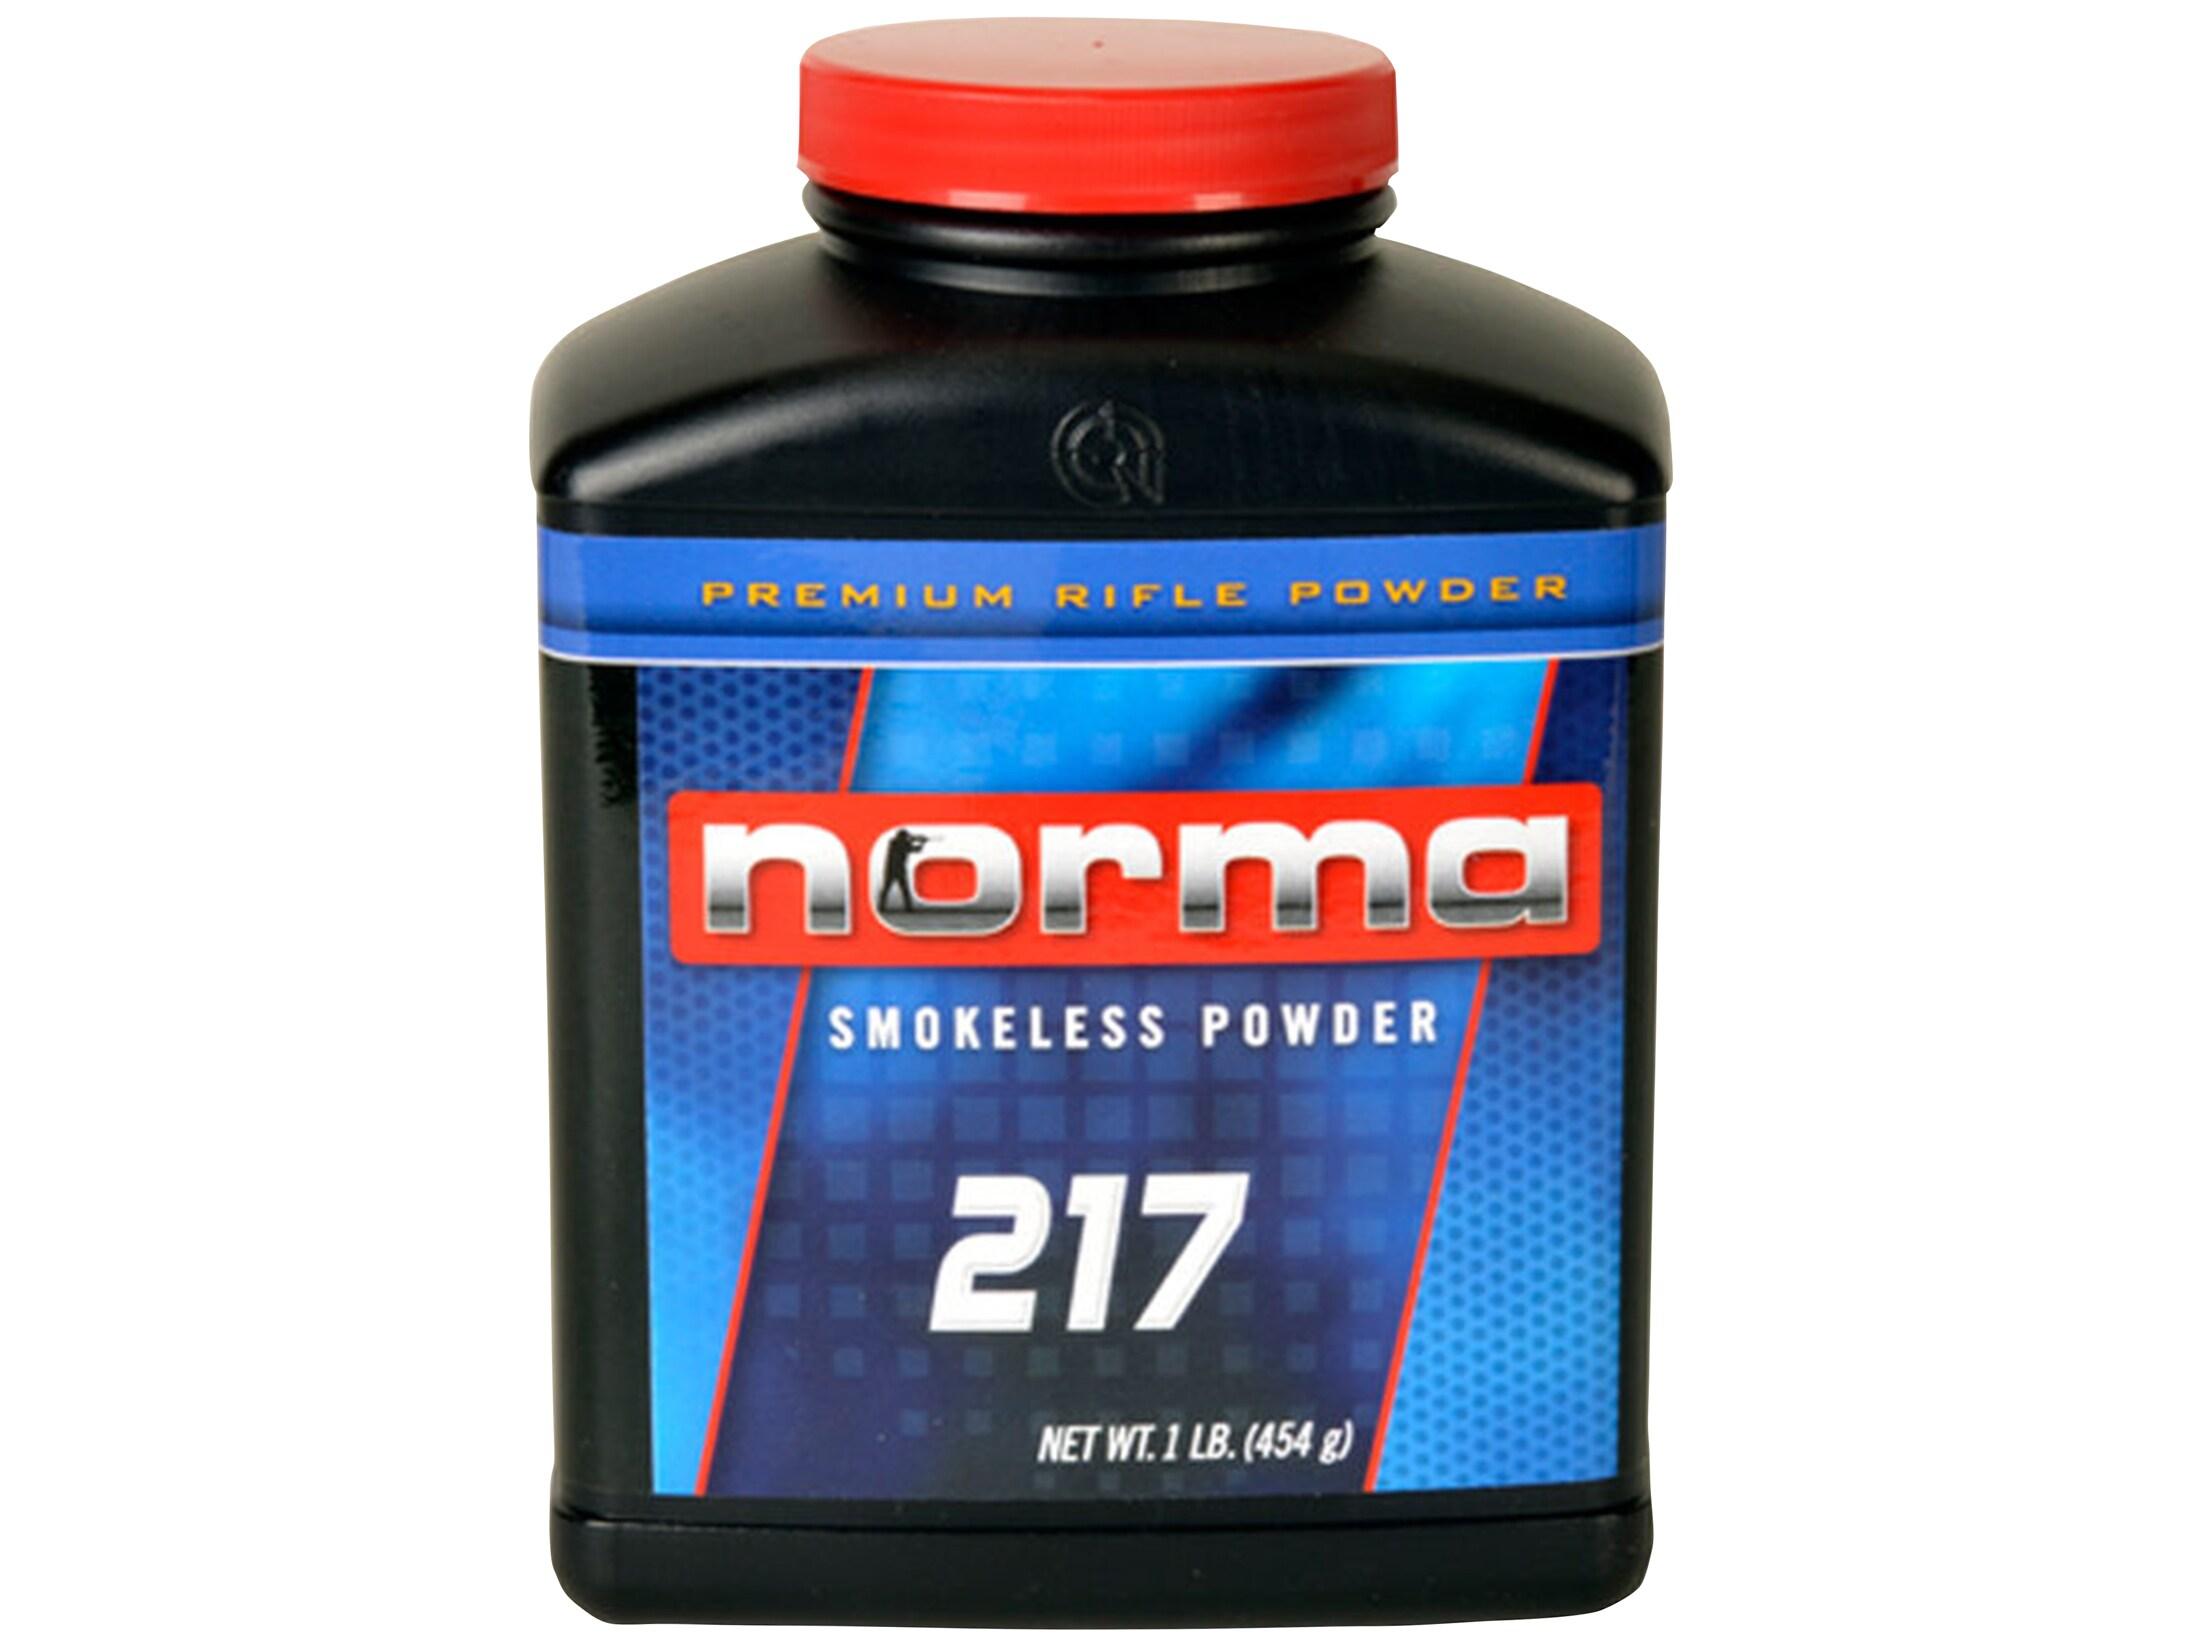 IMR Enduron 8133 Smokeless Gun Powder 8 lb